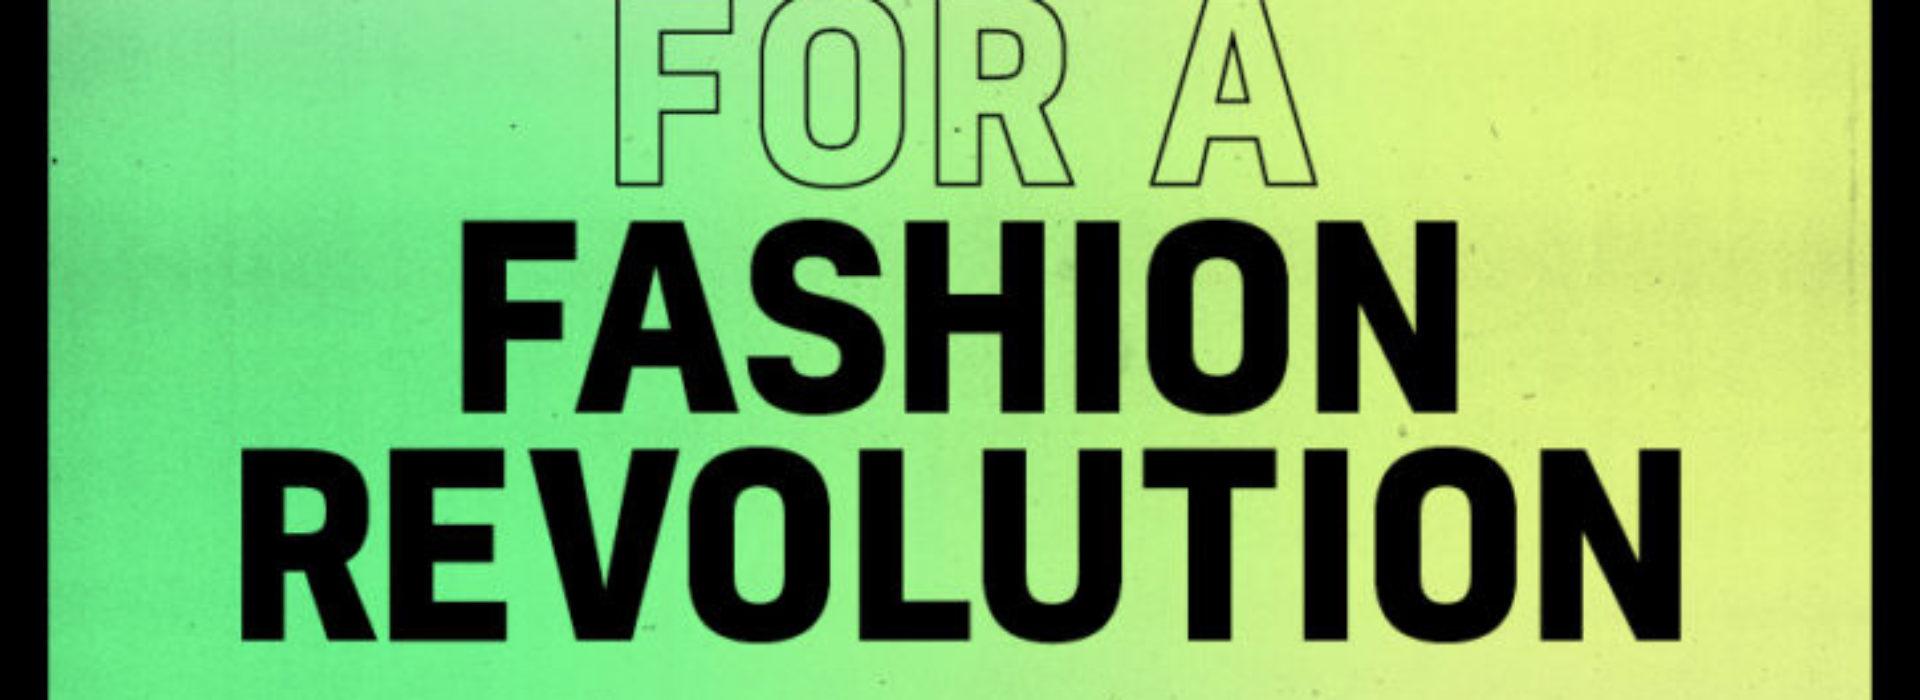 FashRev_Campaign_posters19